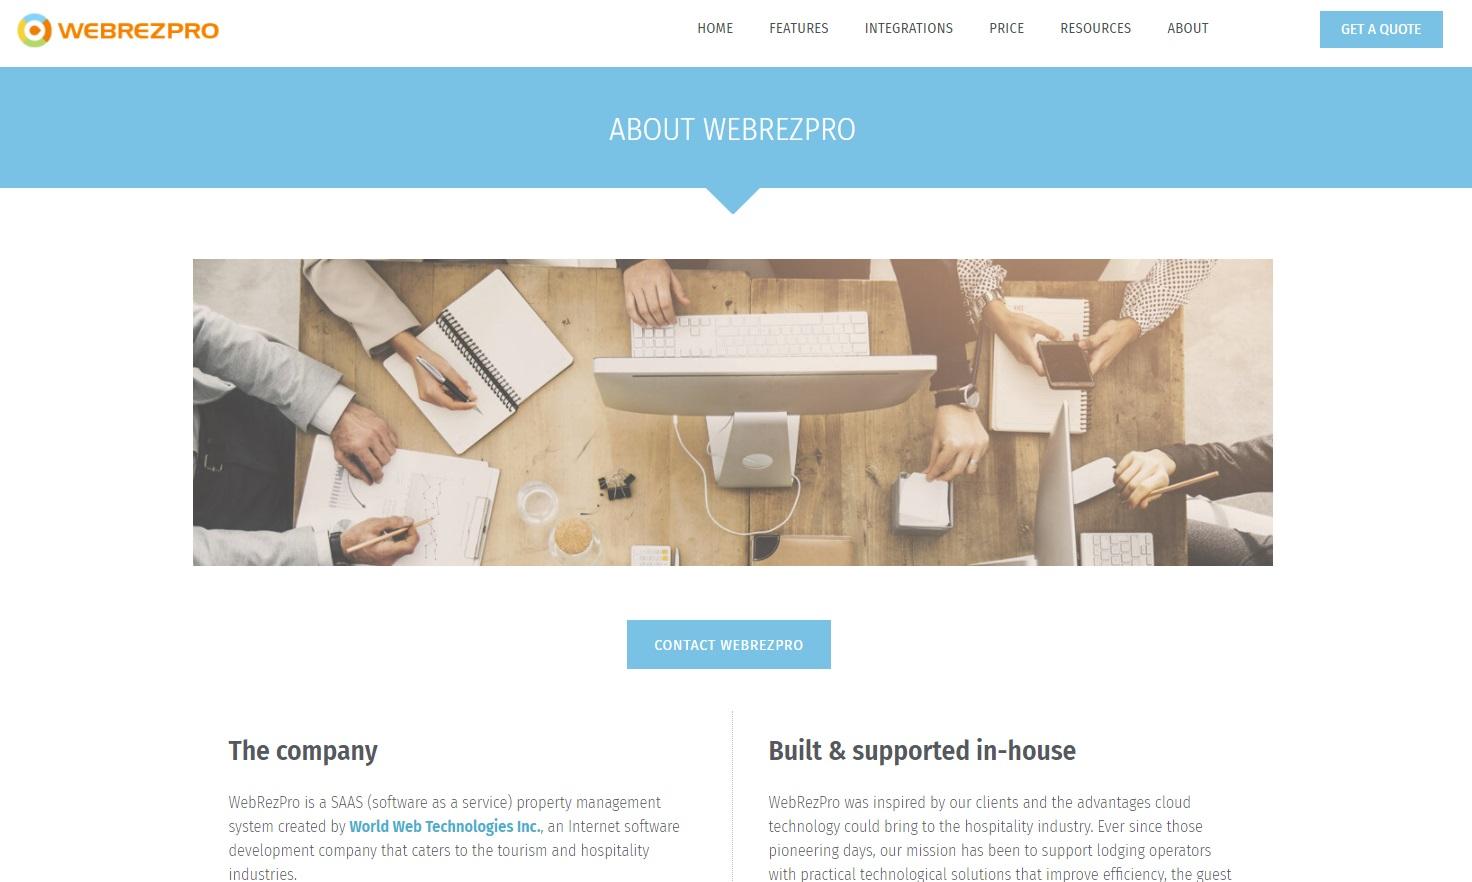 WebRezPro website screenshot